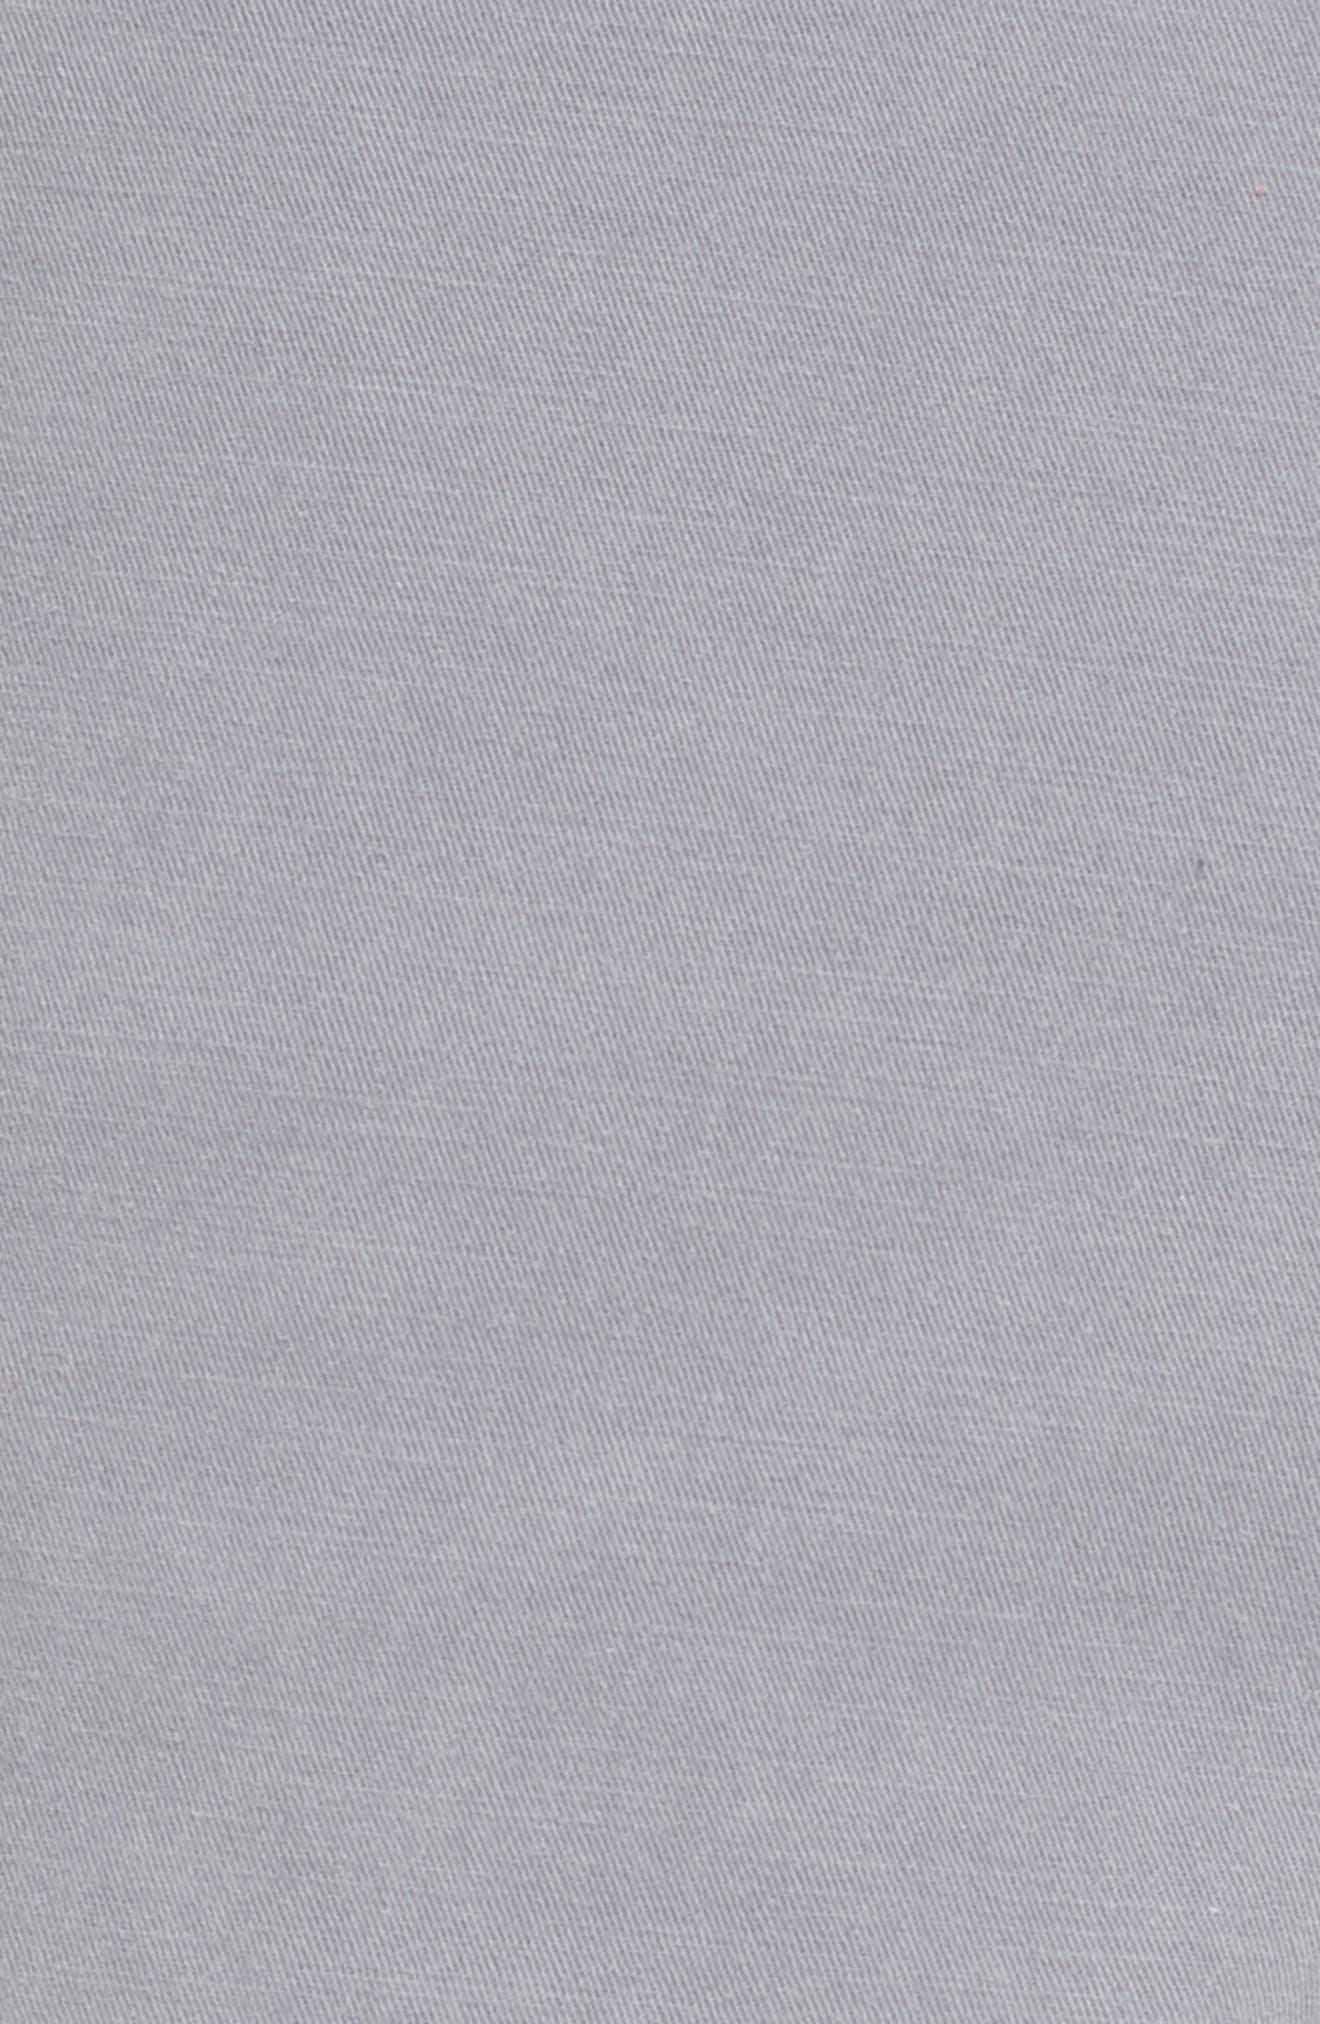 Frost Wash Shorts,                             Alternate thumbnail 5, color,                             050